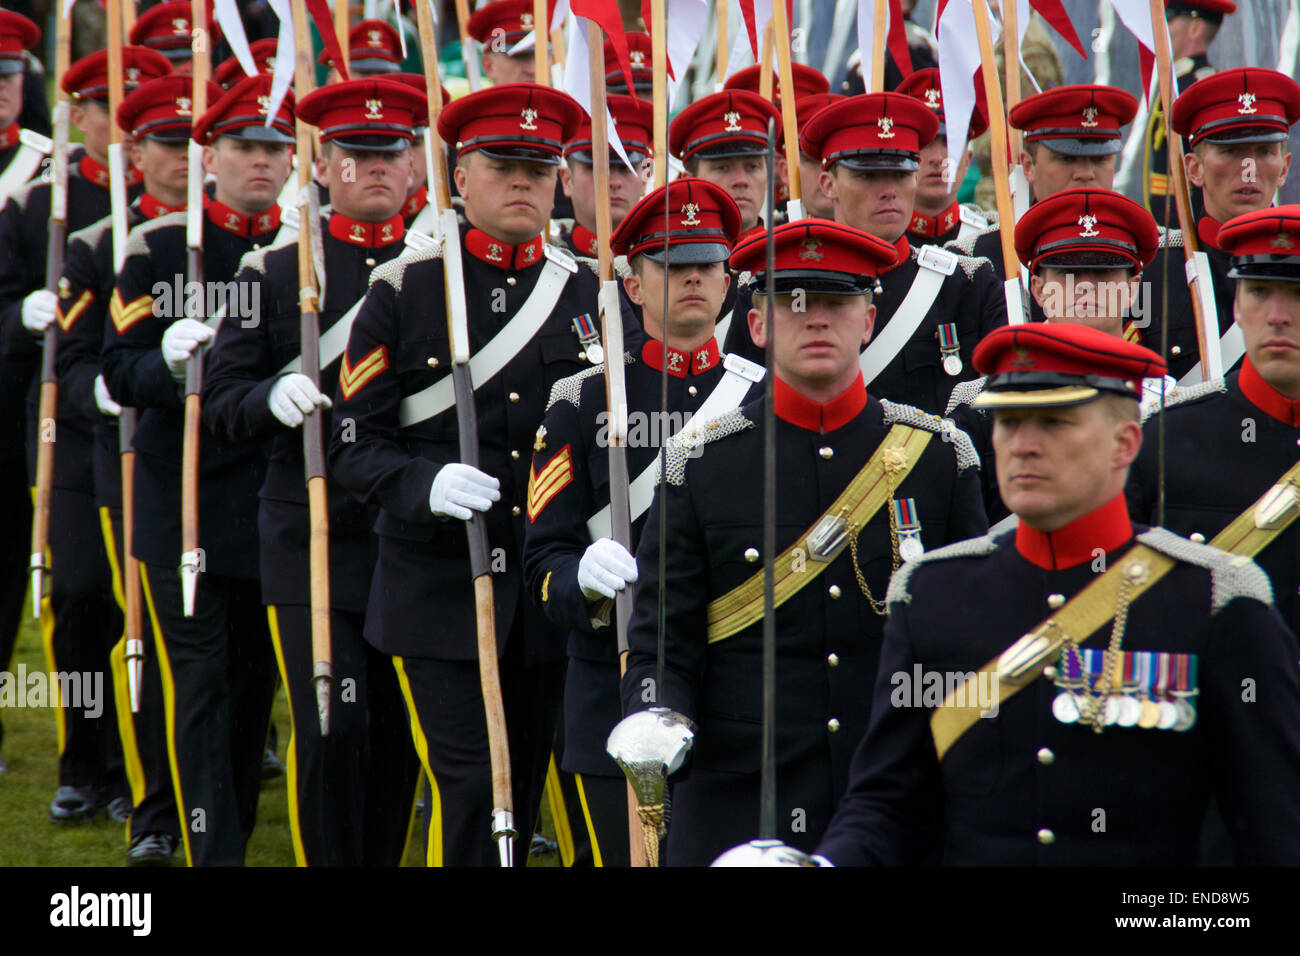 9th-12th Royal Lancers Pin de Solapa